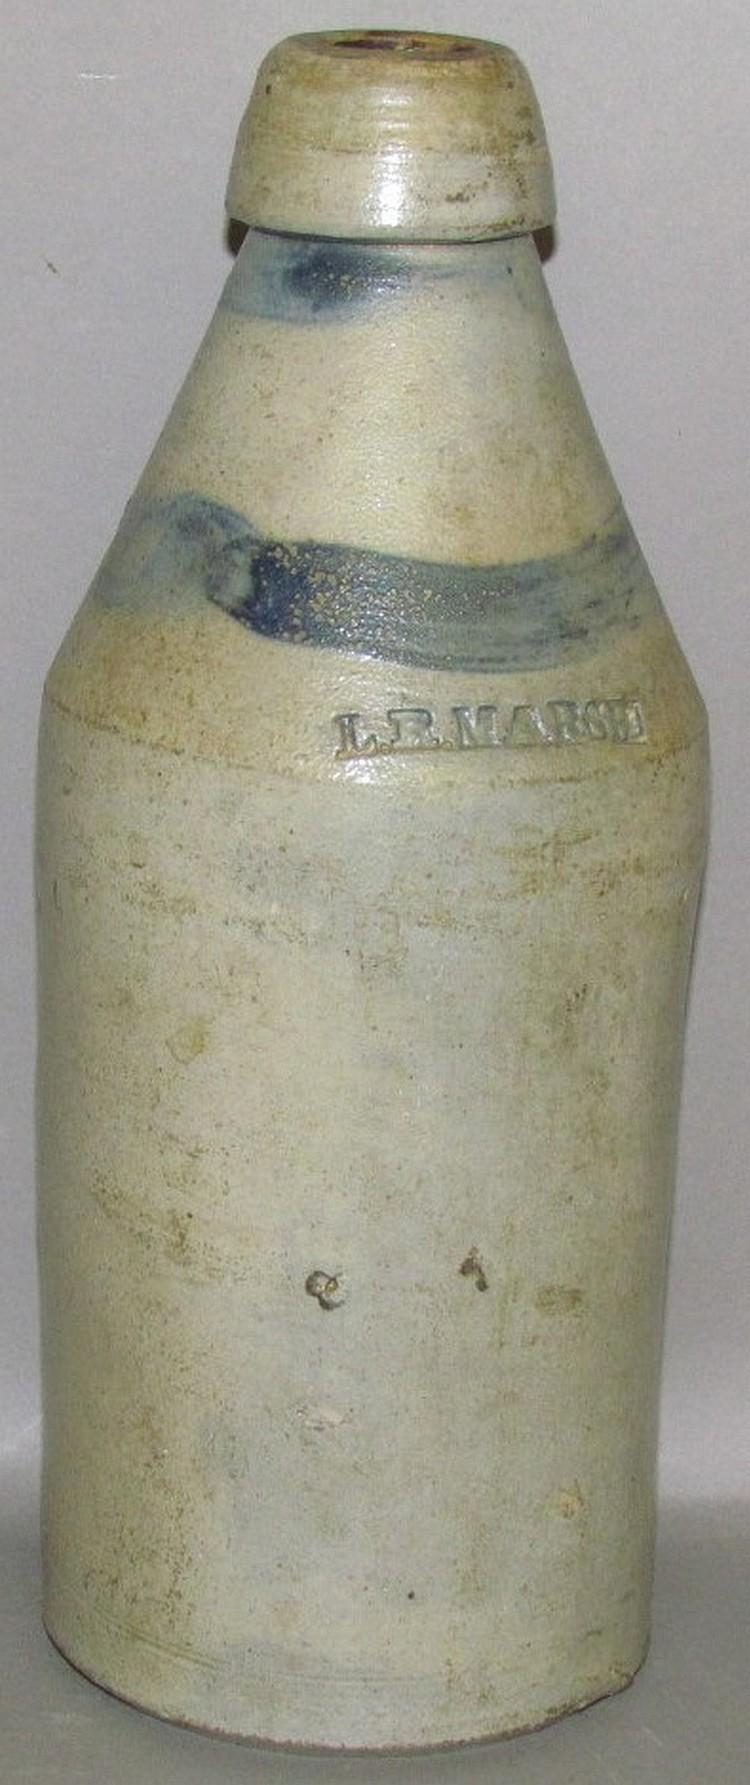 LR Marsh cobalt decorated stoneware bottle